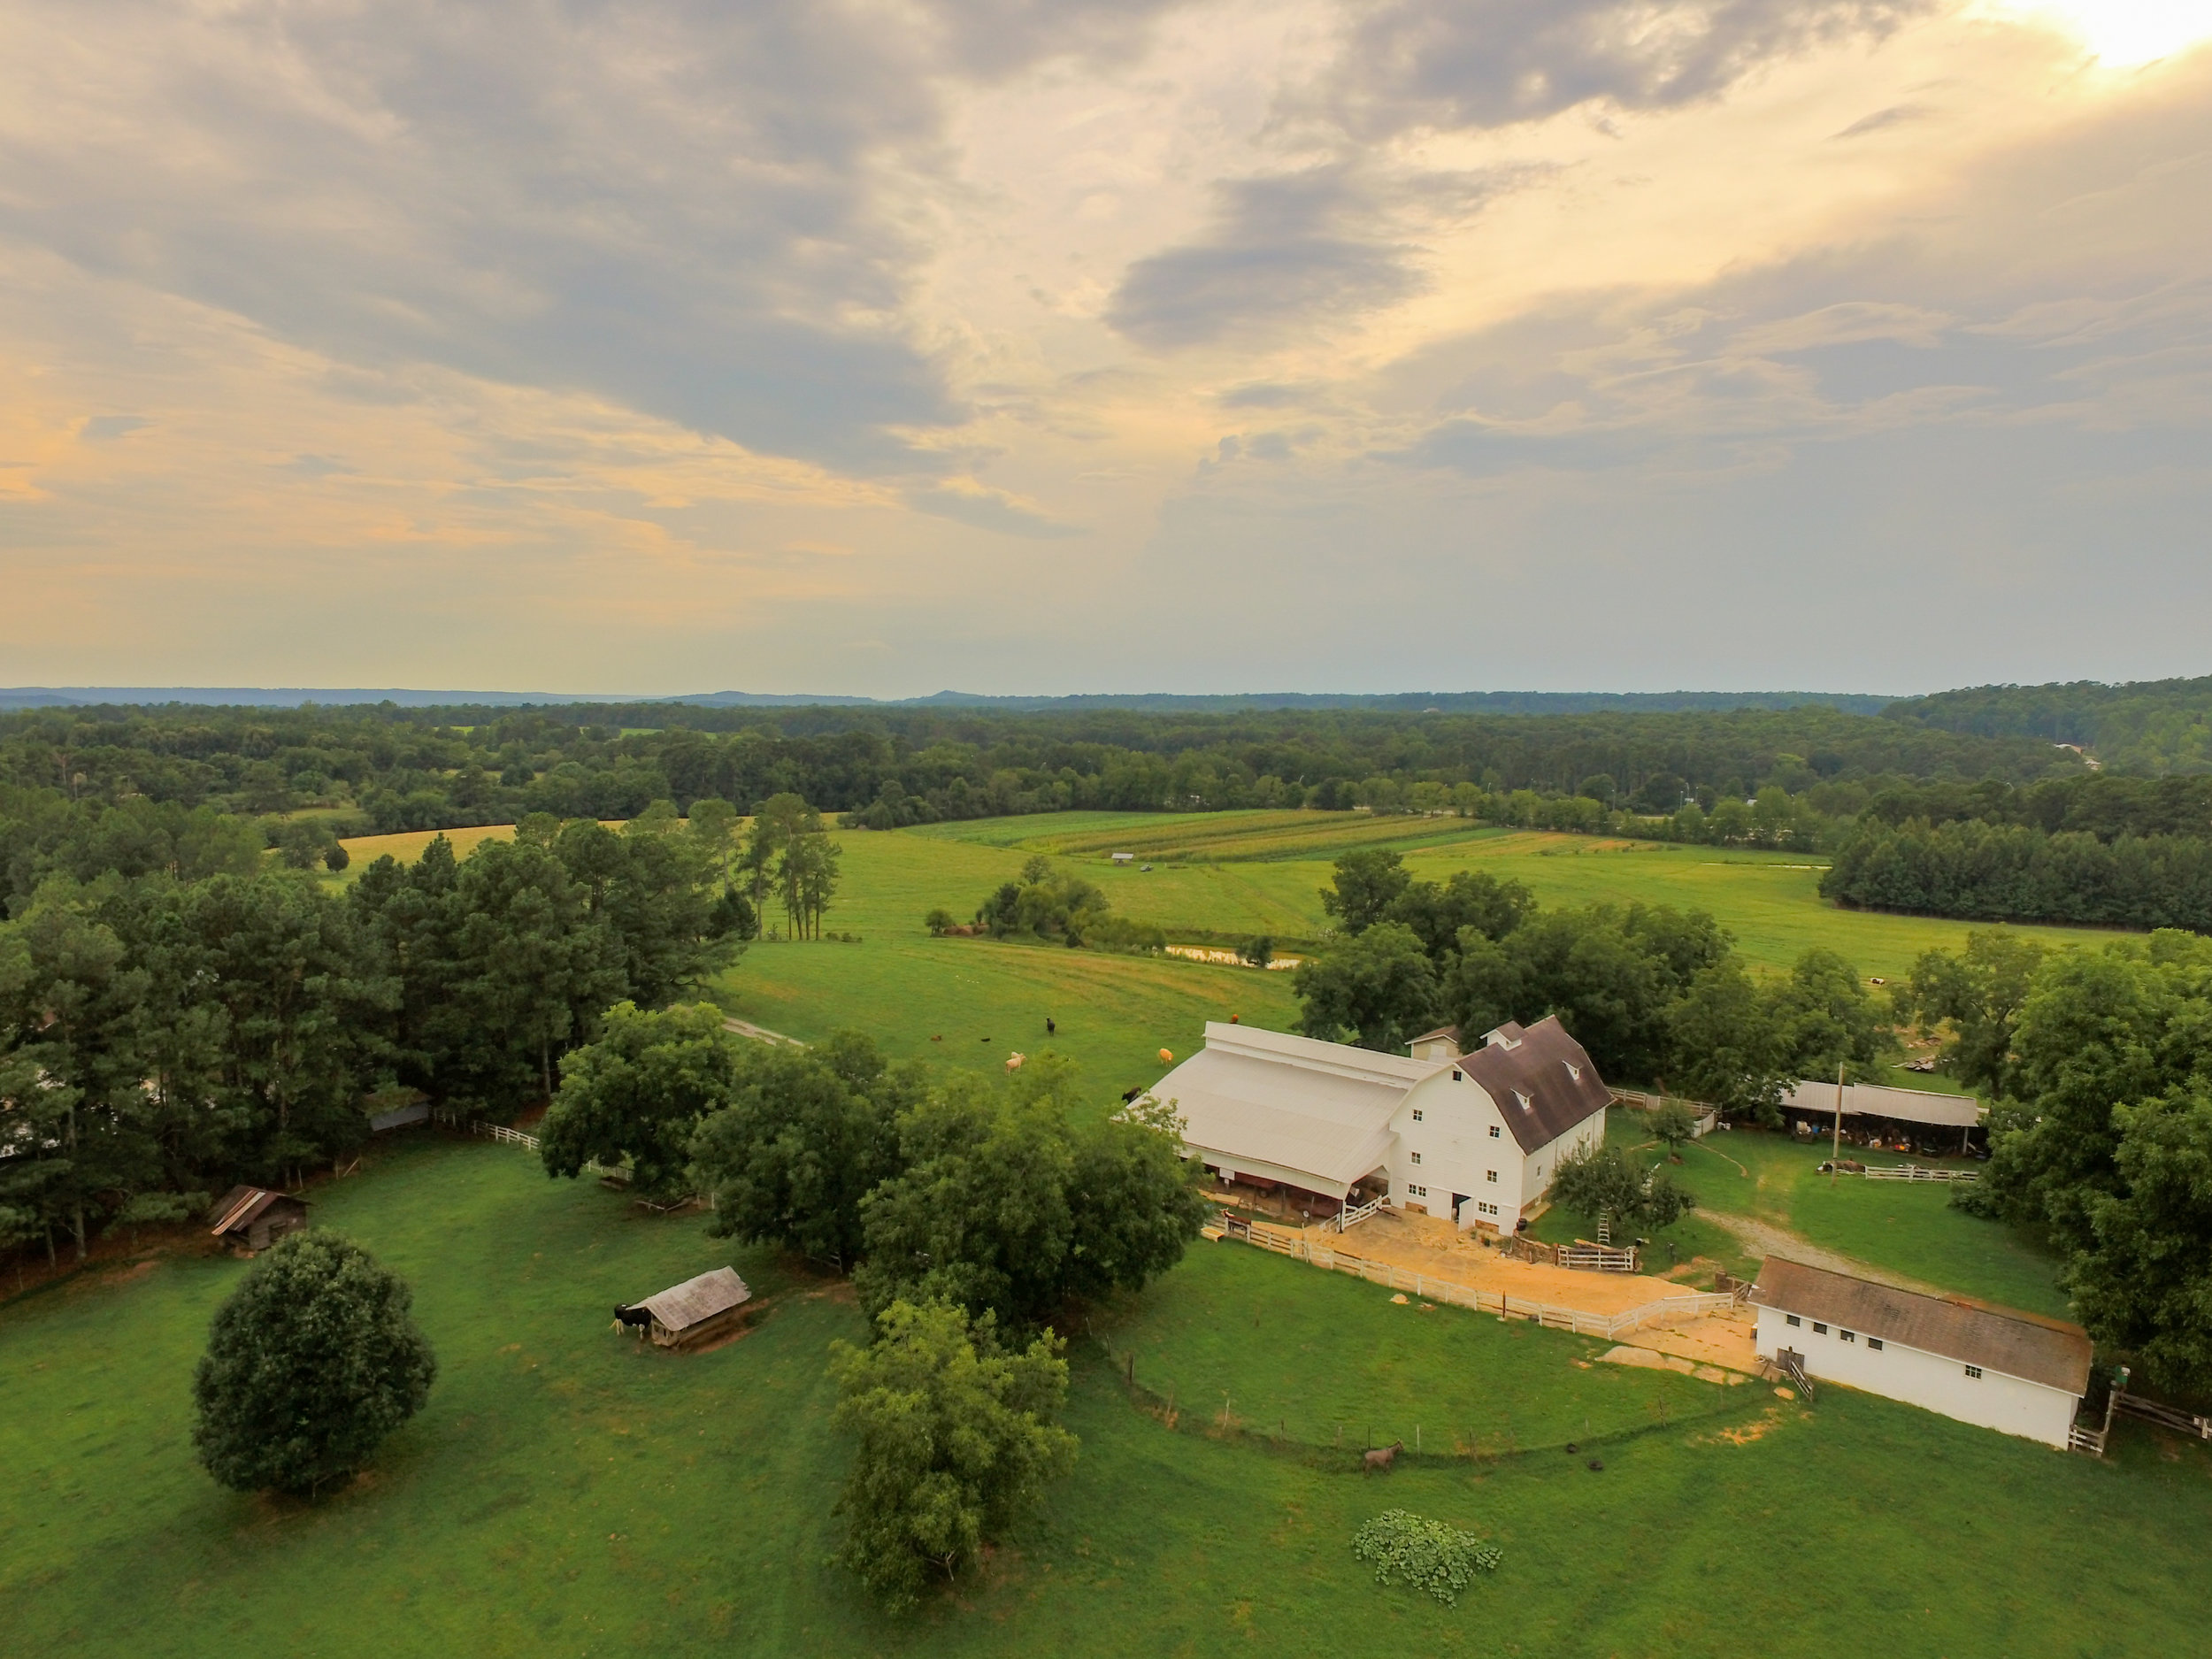 dave-warren-cullman-alabama-aerial-photography-peinhardt-farms-1.jpg